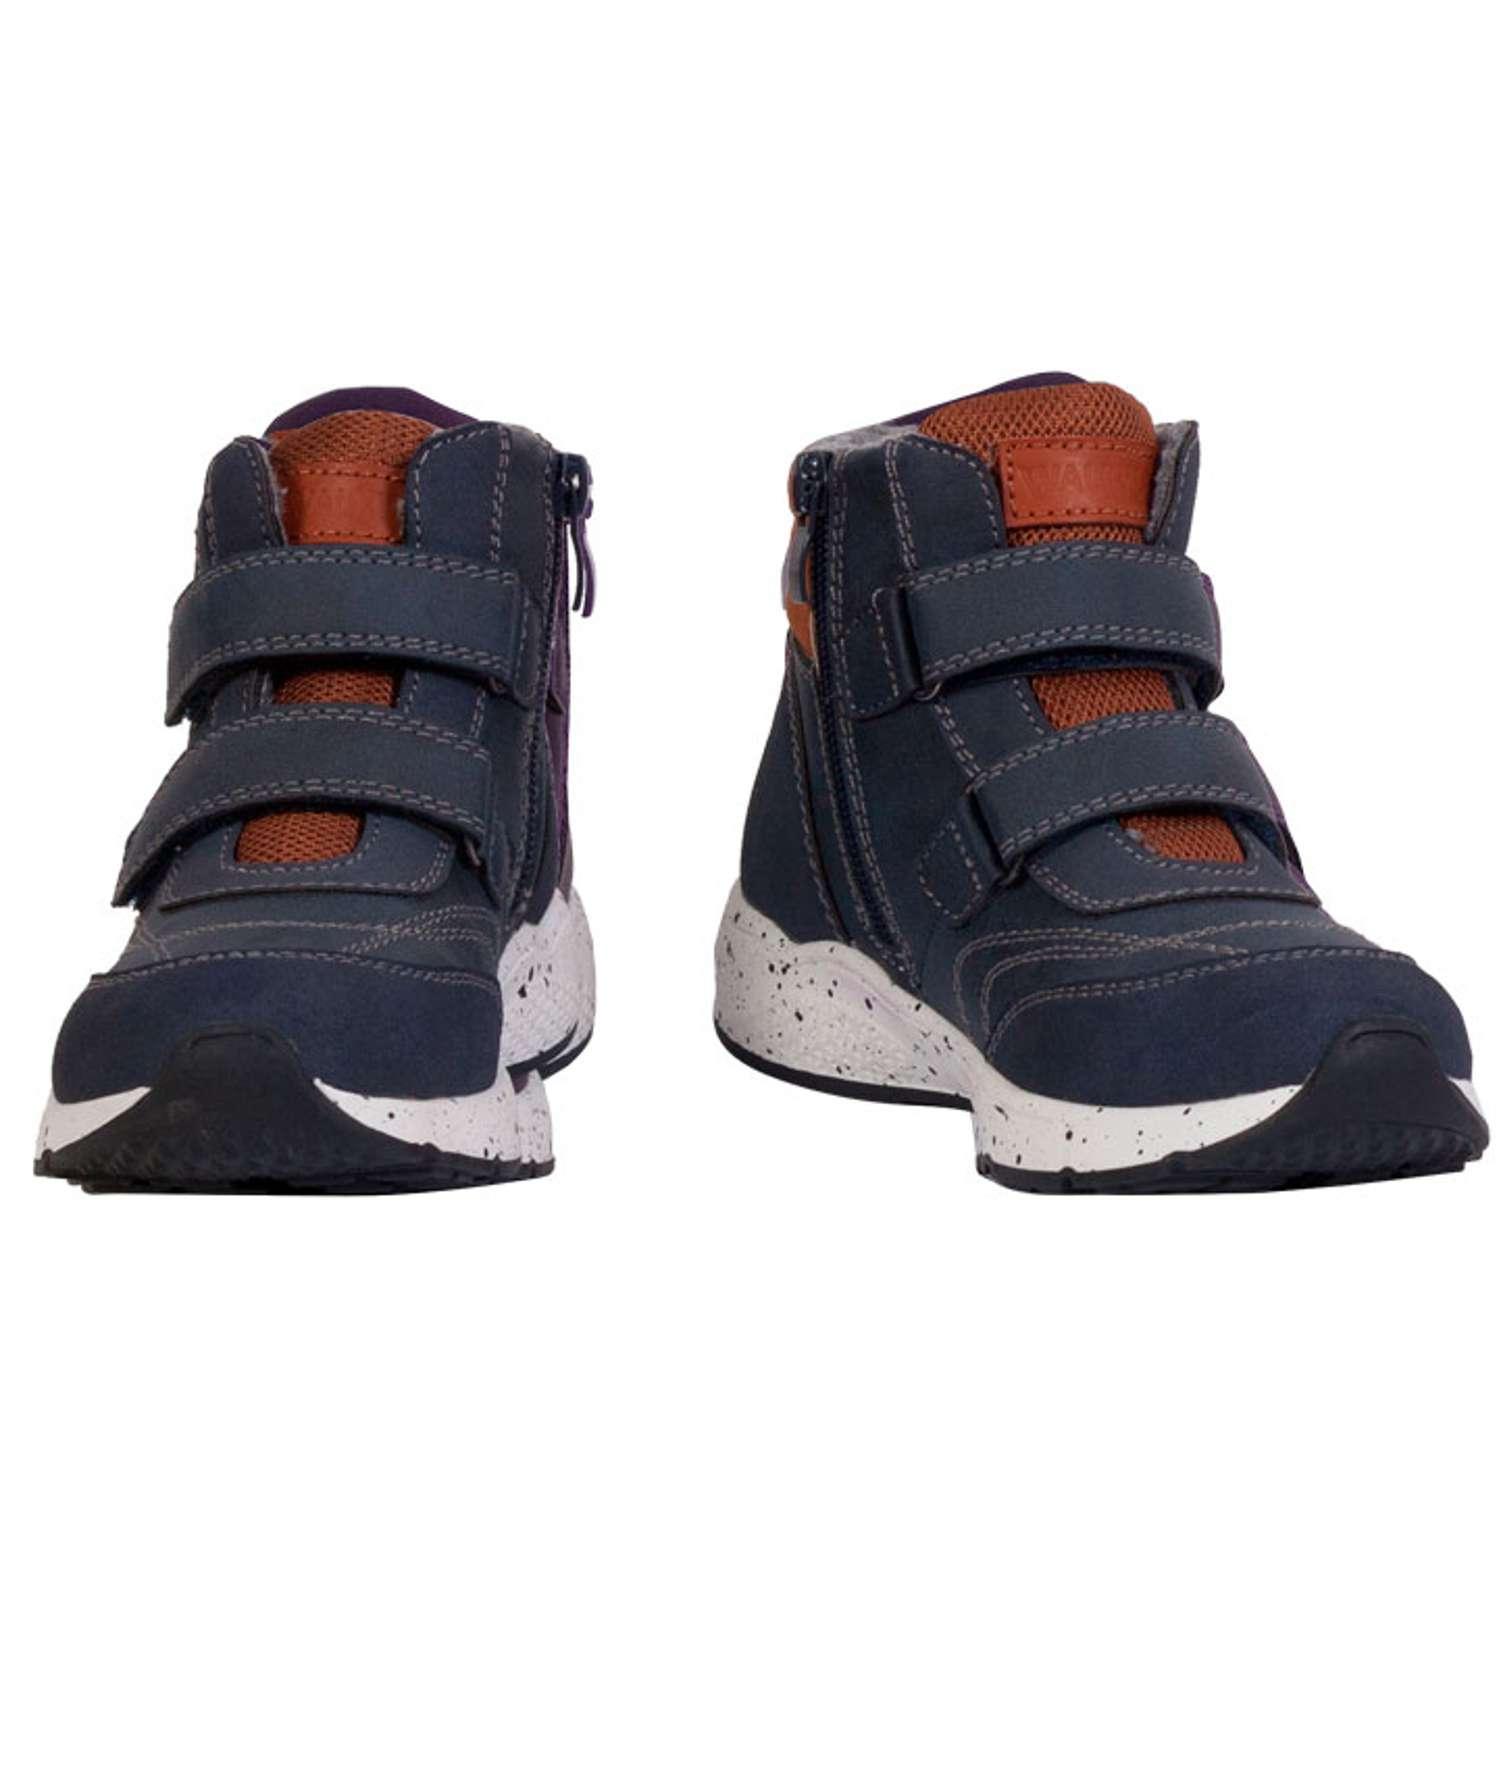 Walkway - Akako børne vinter sneakers - Mørkeblå - Størrelse 32